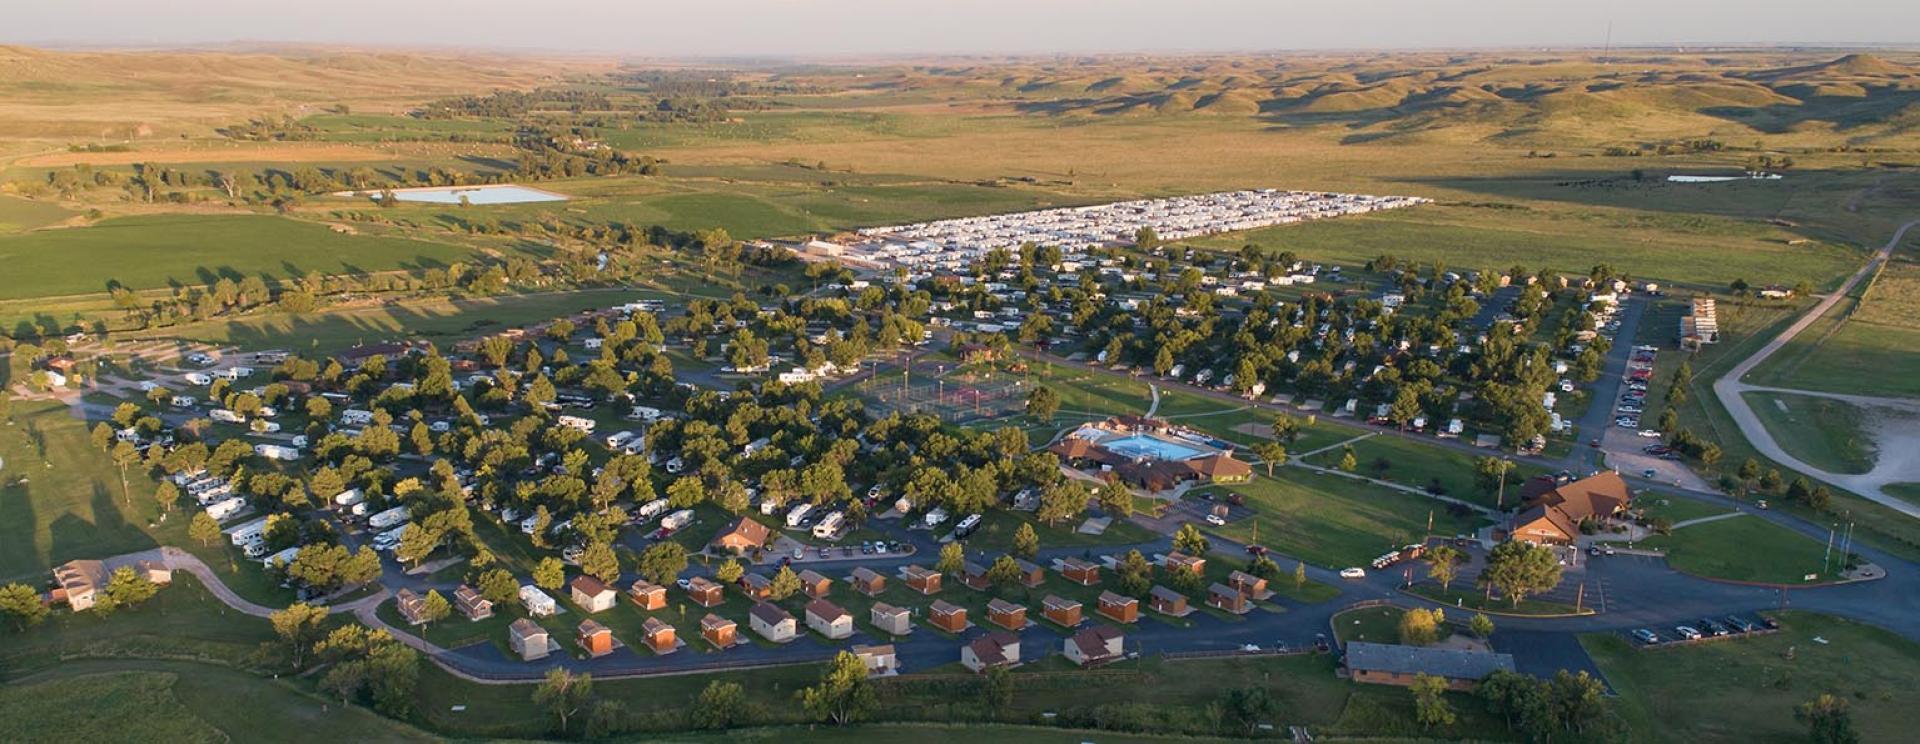 Hart Ranch Camping Resort